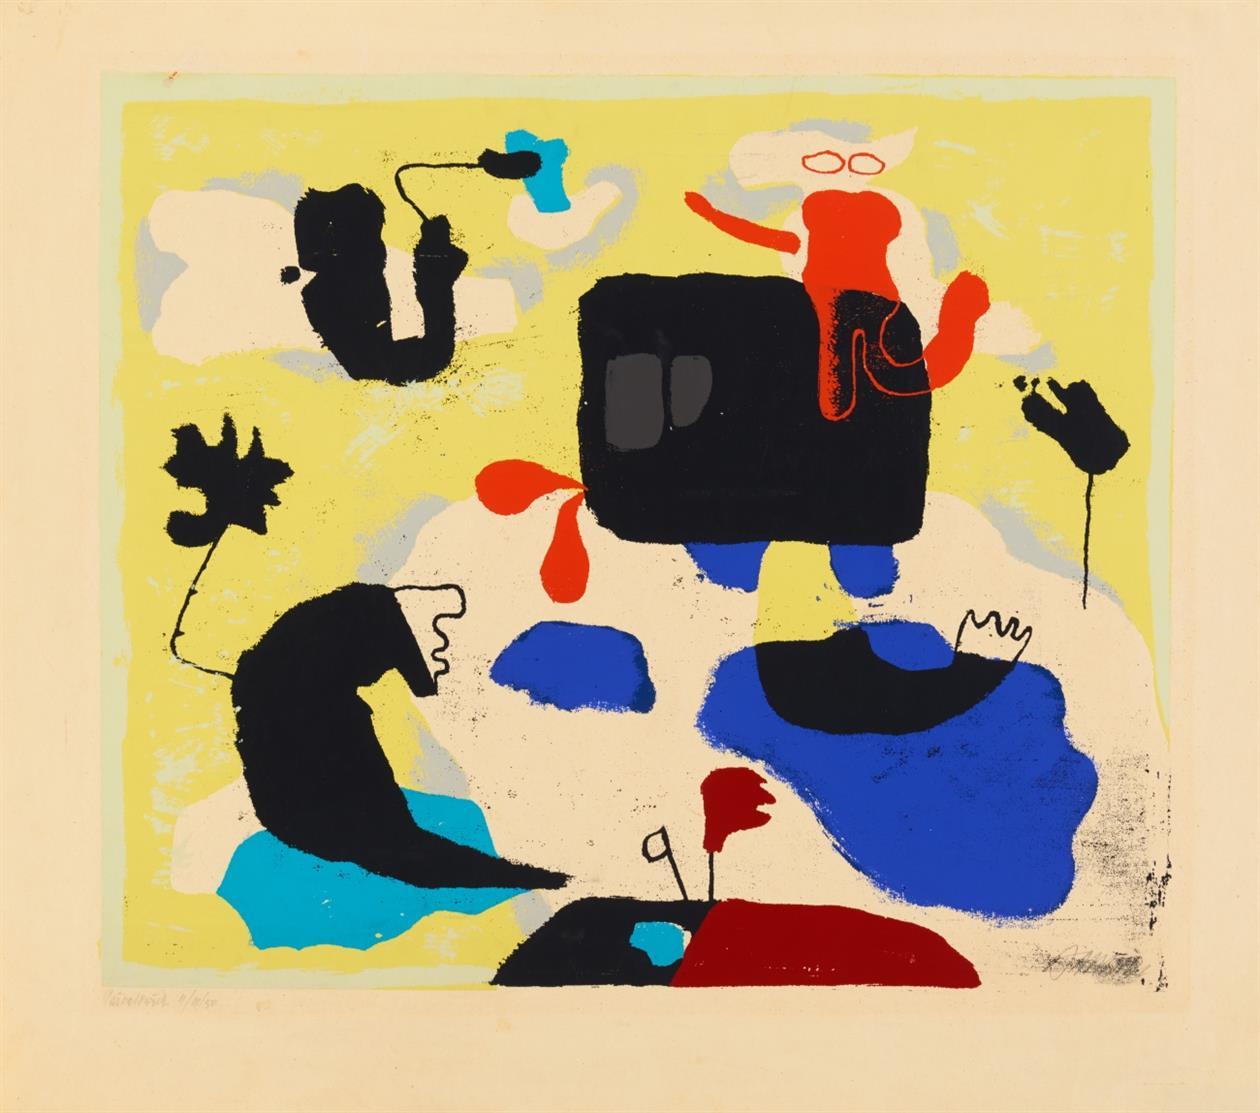 Willi Baumeister. Moby Dick. 1951. Farbserigraphie. Signiert. Privatdruck II/III/50. Spielmann 175.